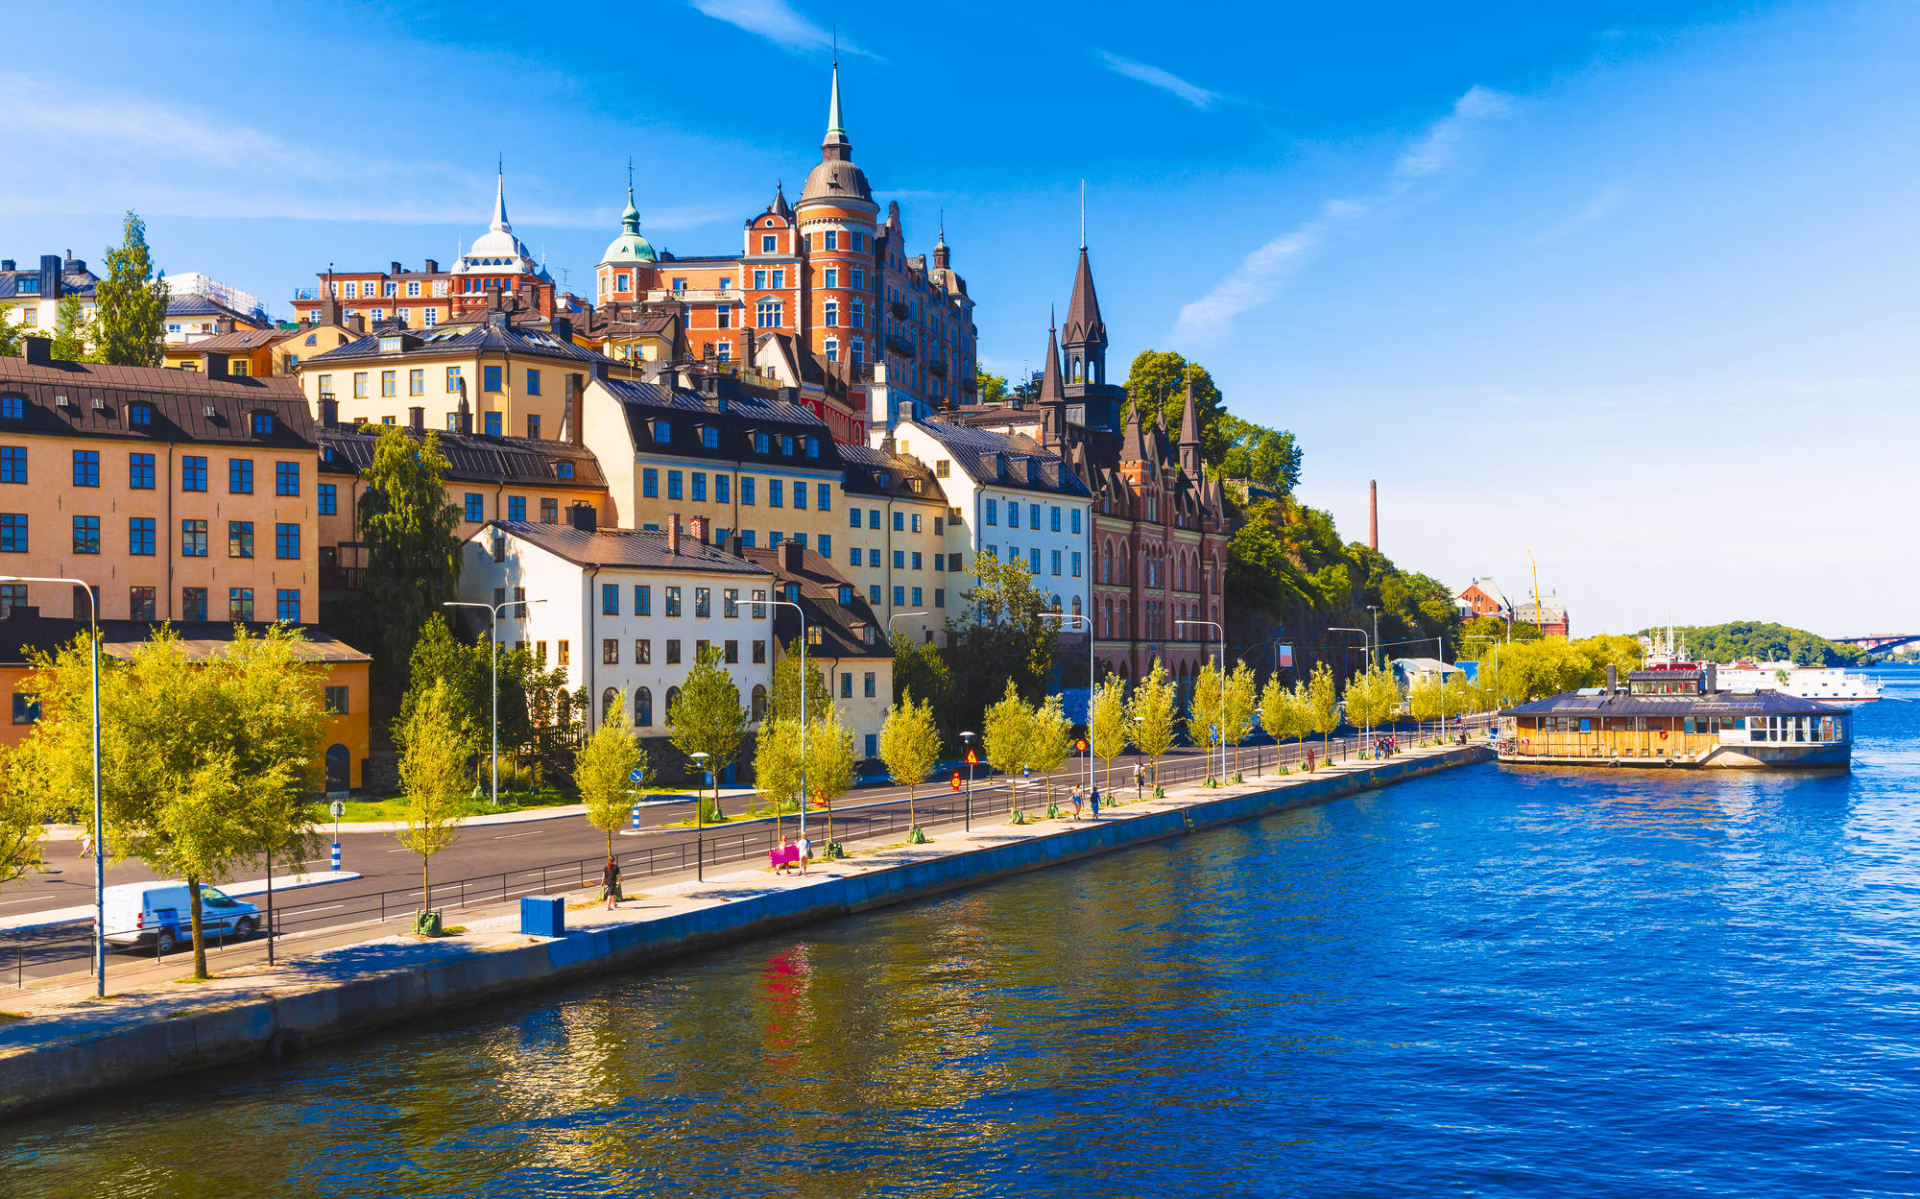 Comfort Xpress in Stockholm: Panoramablick auf die Altstadt im Stadtteil Sodermalm, Stockholm